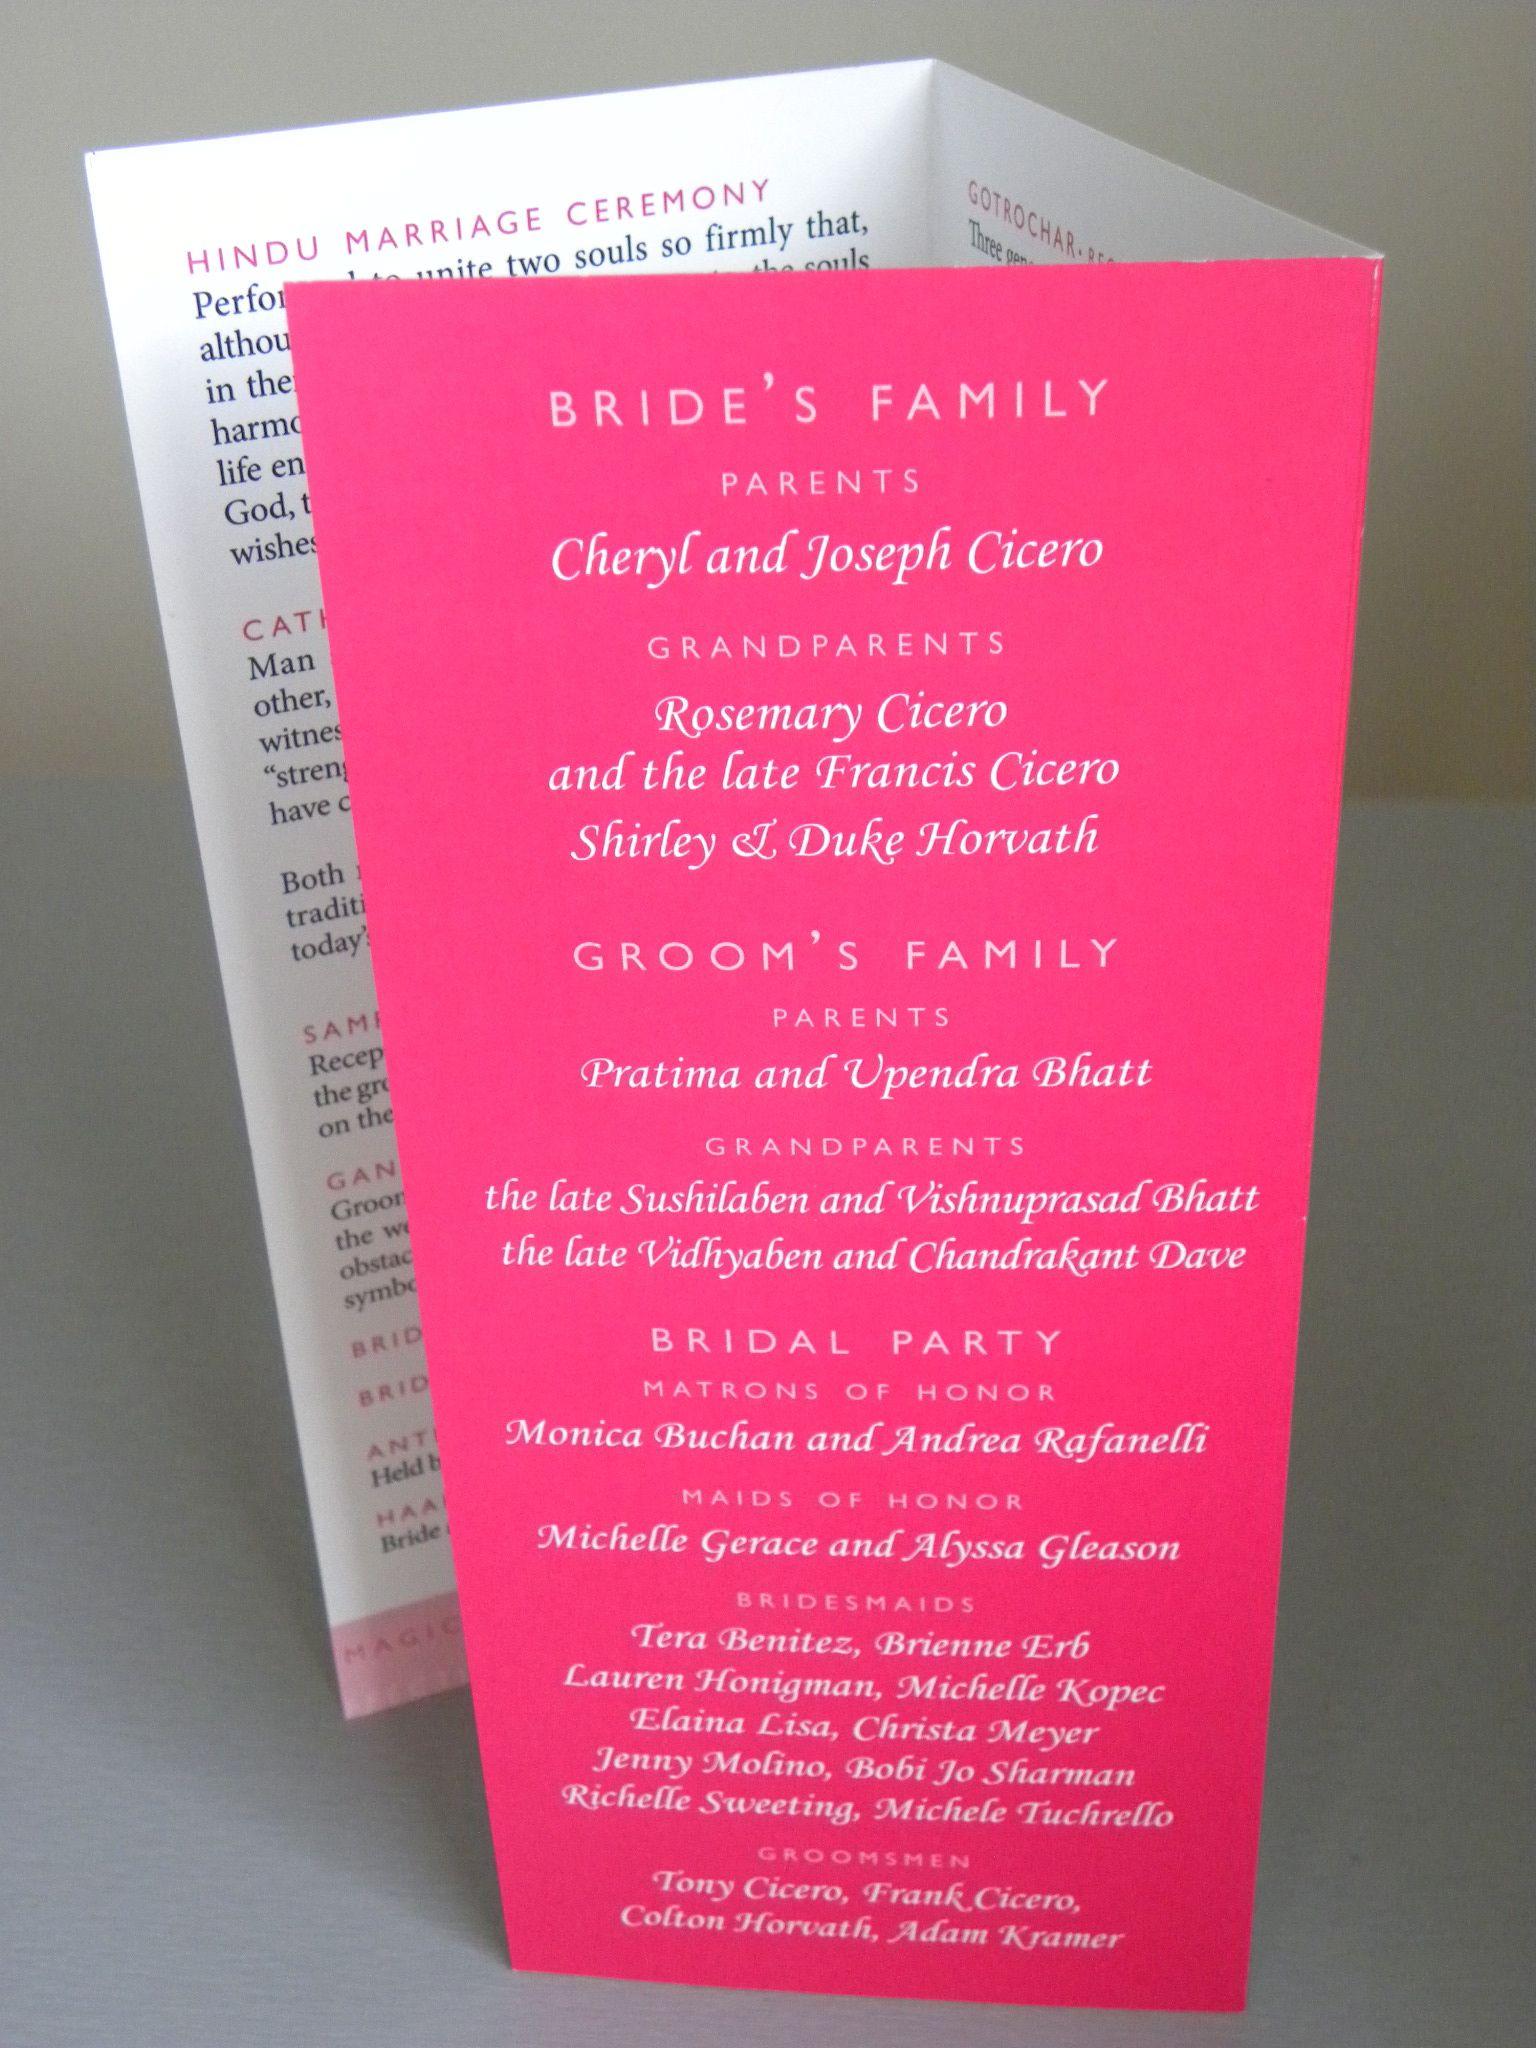 bed bath and beyond wedding invitation kits%0A hindu wedding program